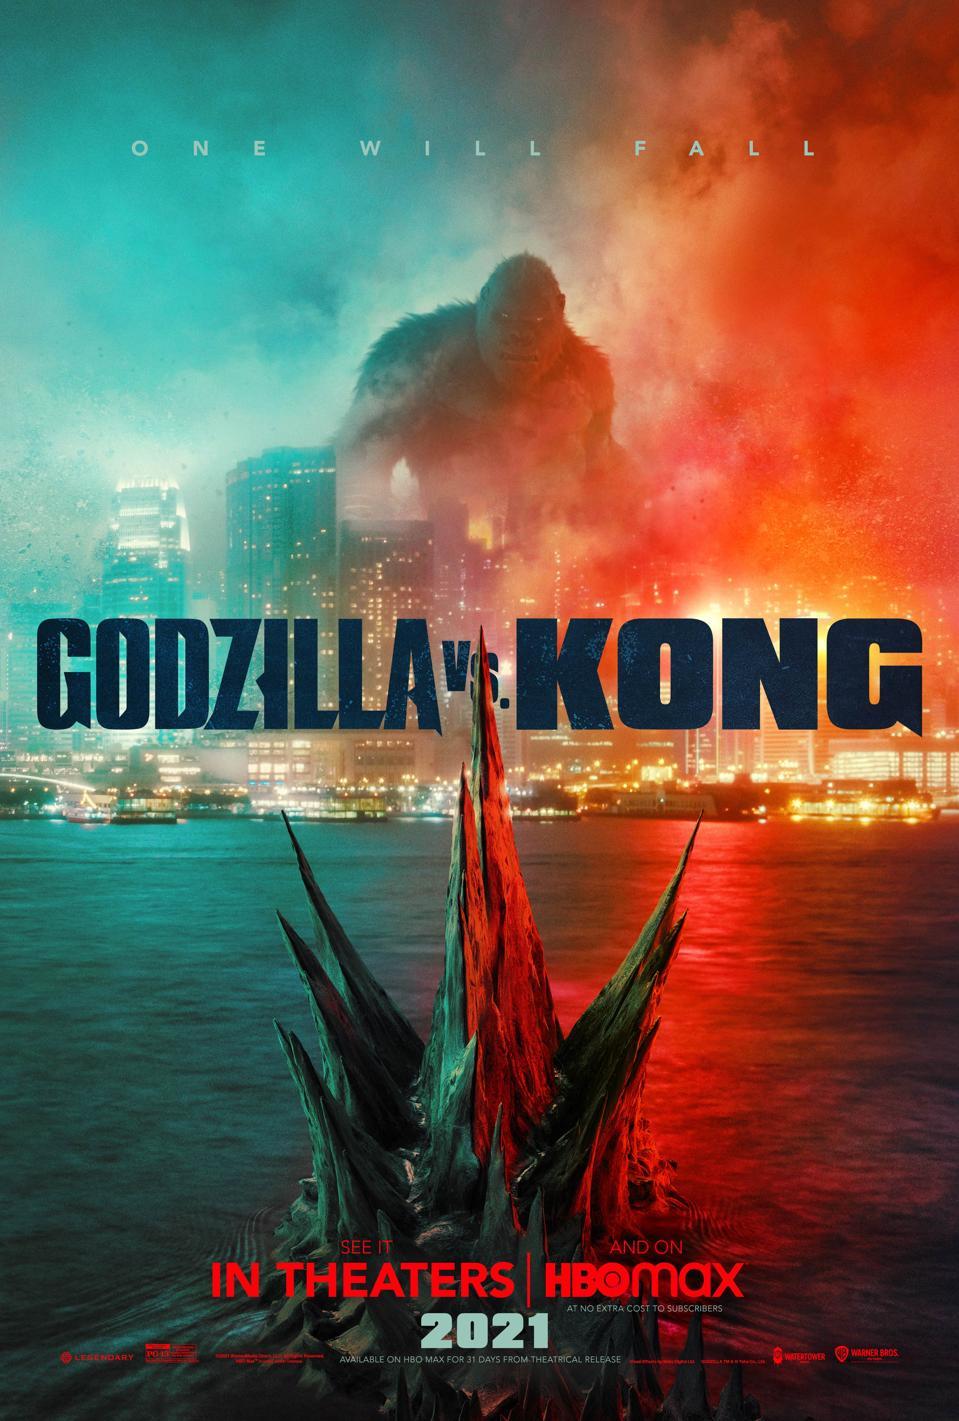 'Godzilla Vs. Kong' poster